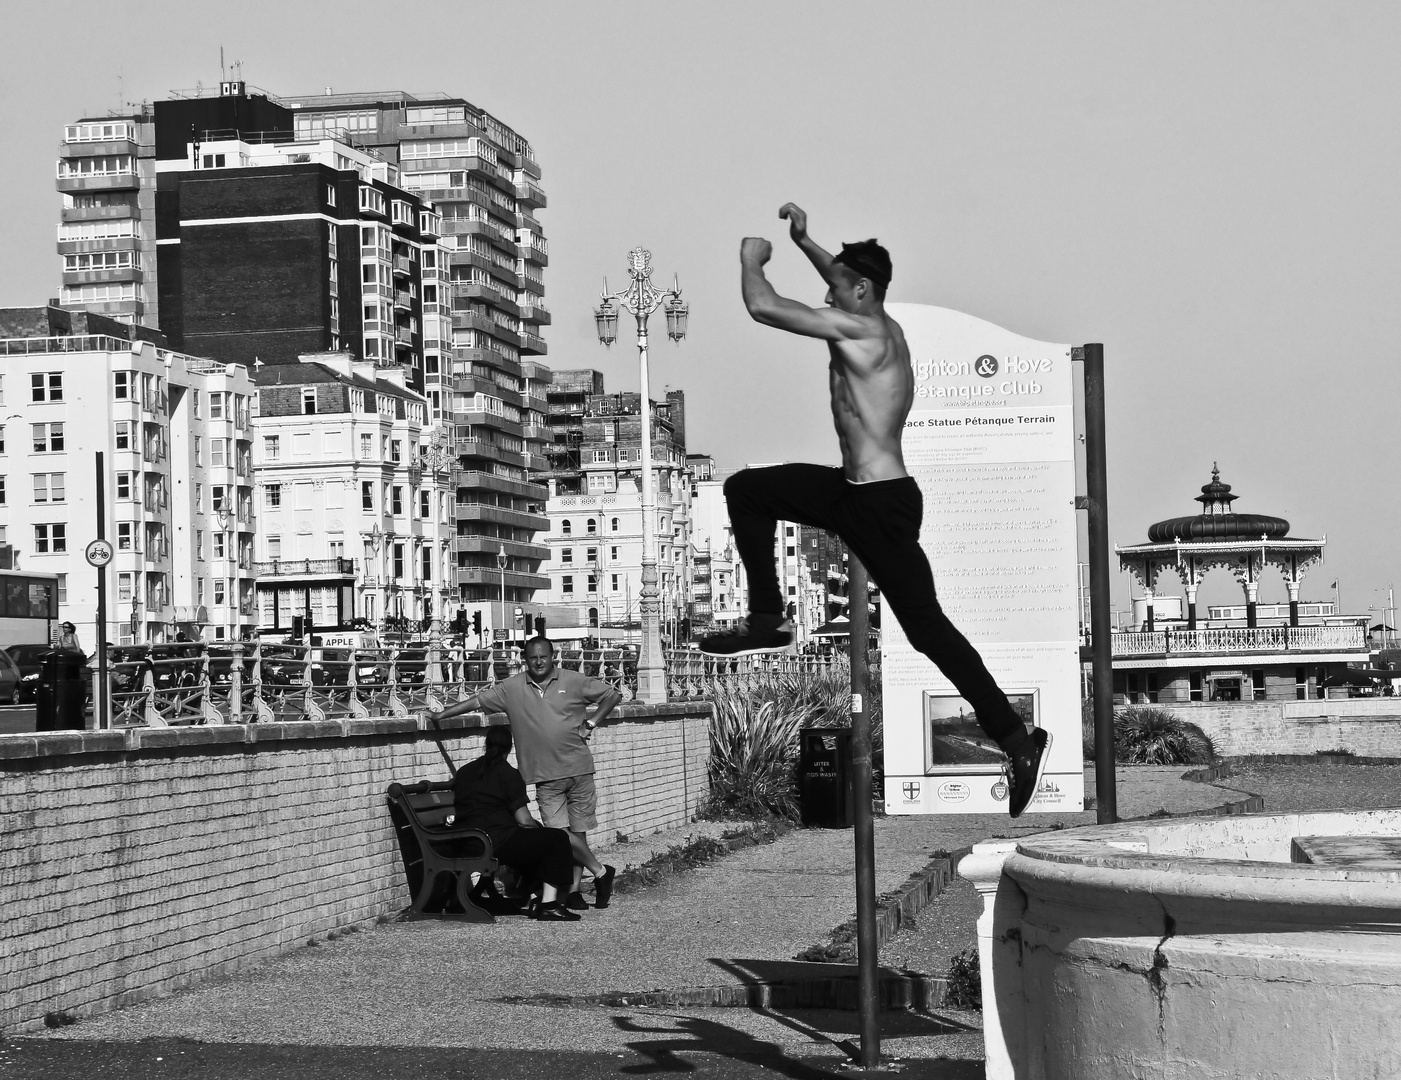 Pole jumpler?